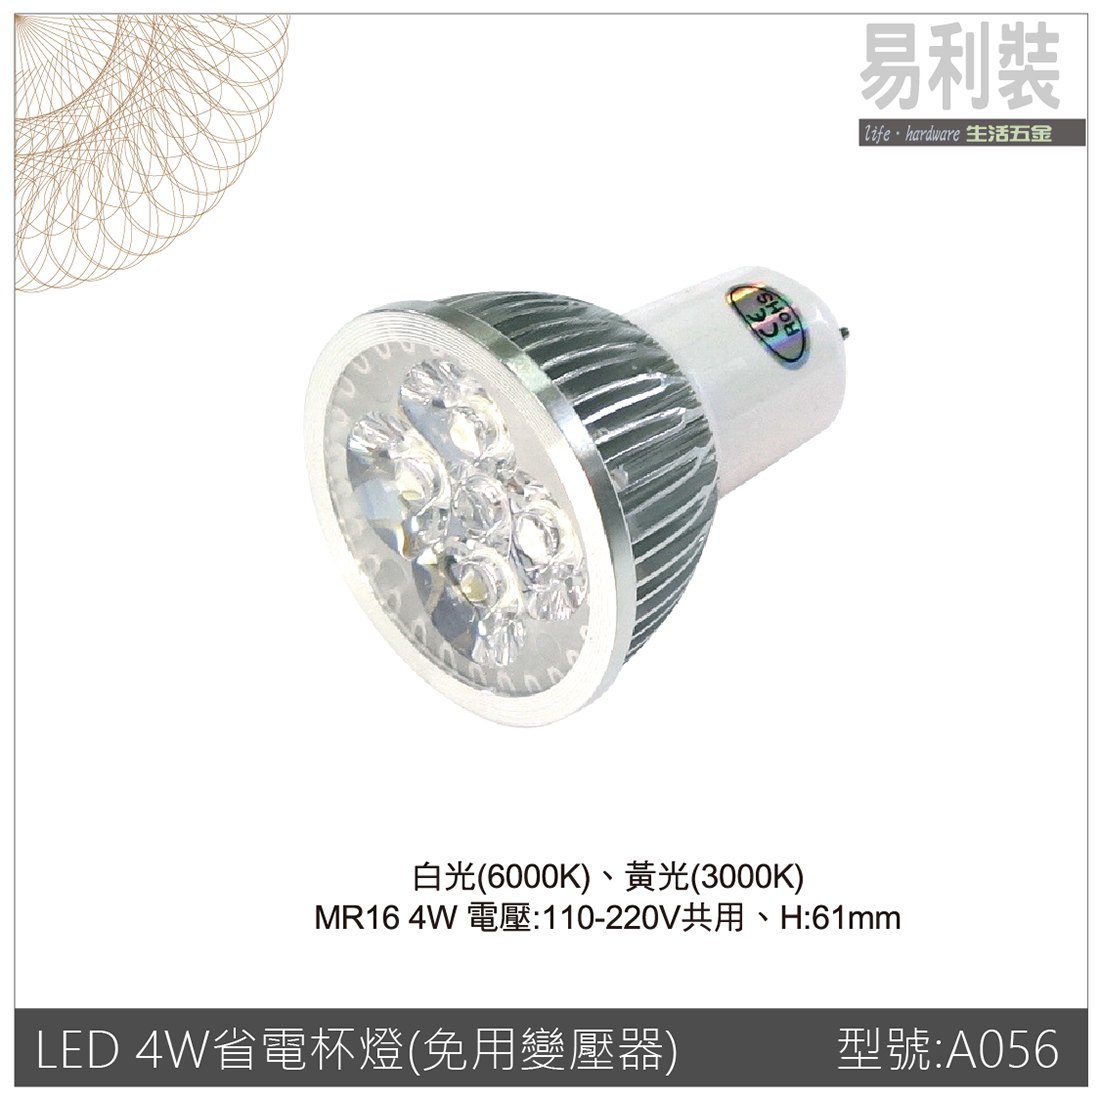 【 EASYCAN 】A056 LED 4W省電杯燈(免用變壓器) 易利裝生活五金 房間 臥房 客廳 小資族 辦公家具 系統家具